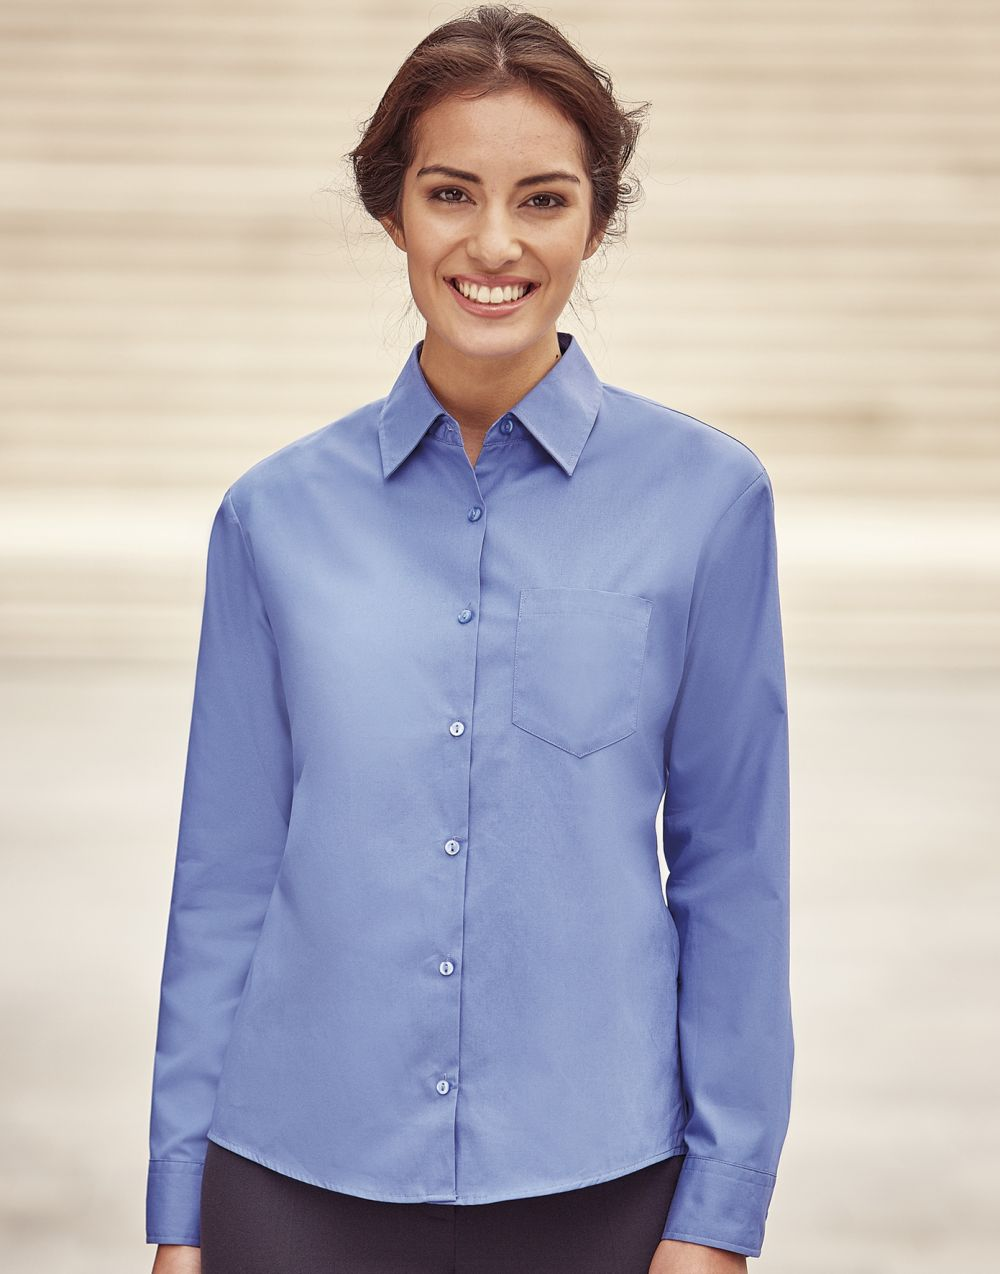 Camisas manga larga russell de mujer 100% algodón manga larga con logo vista 1